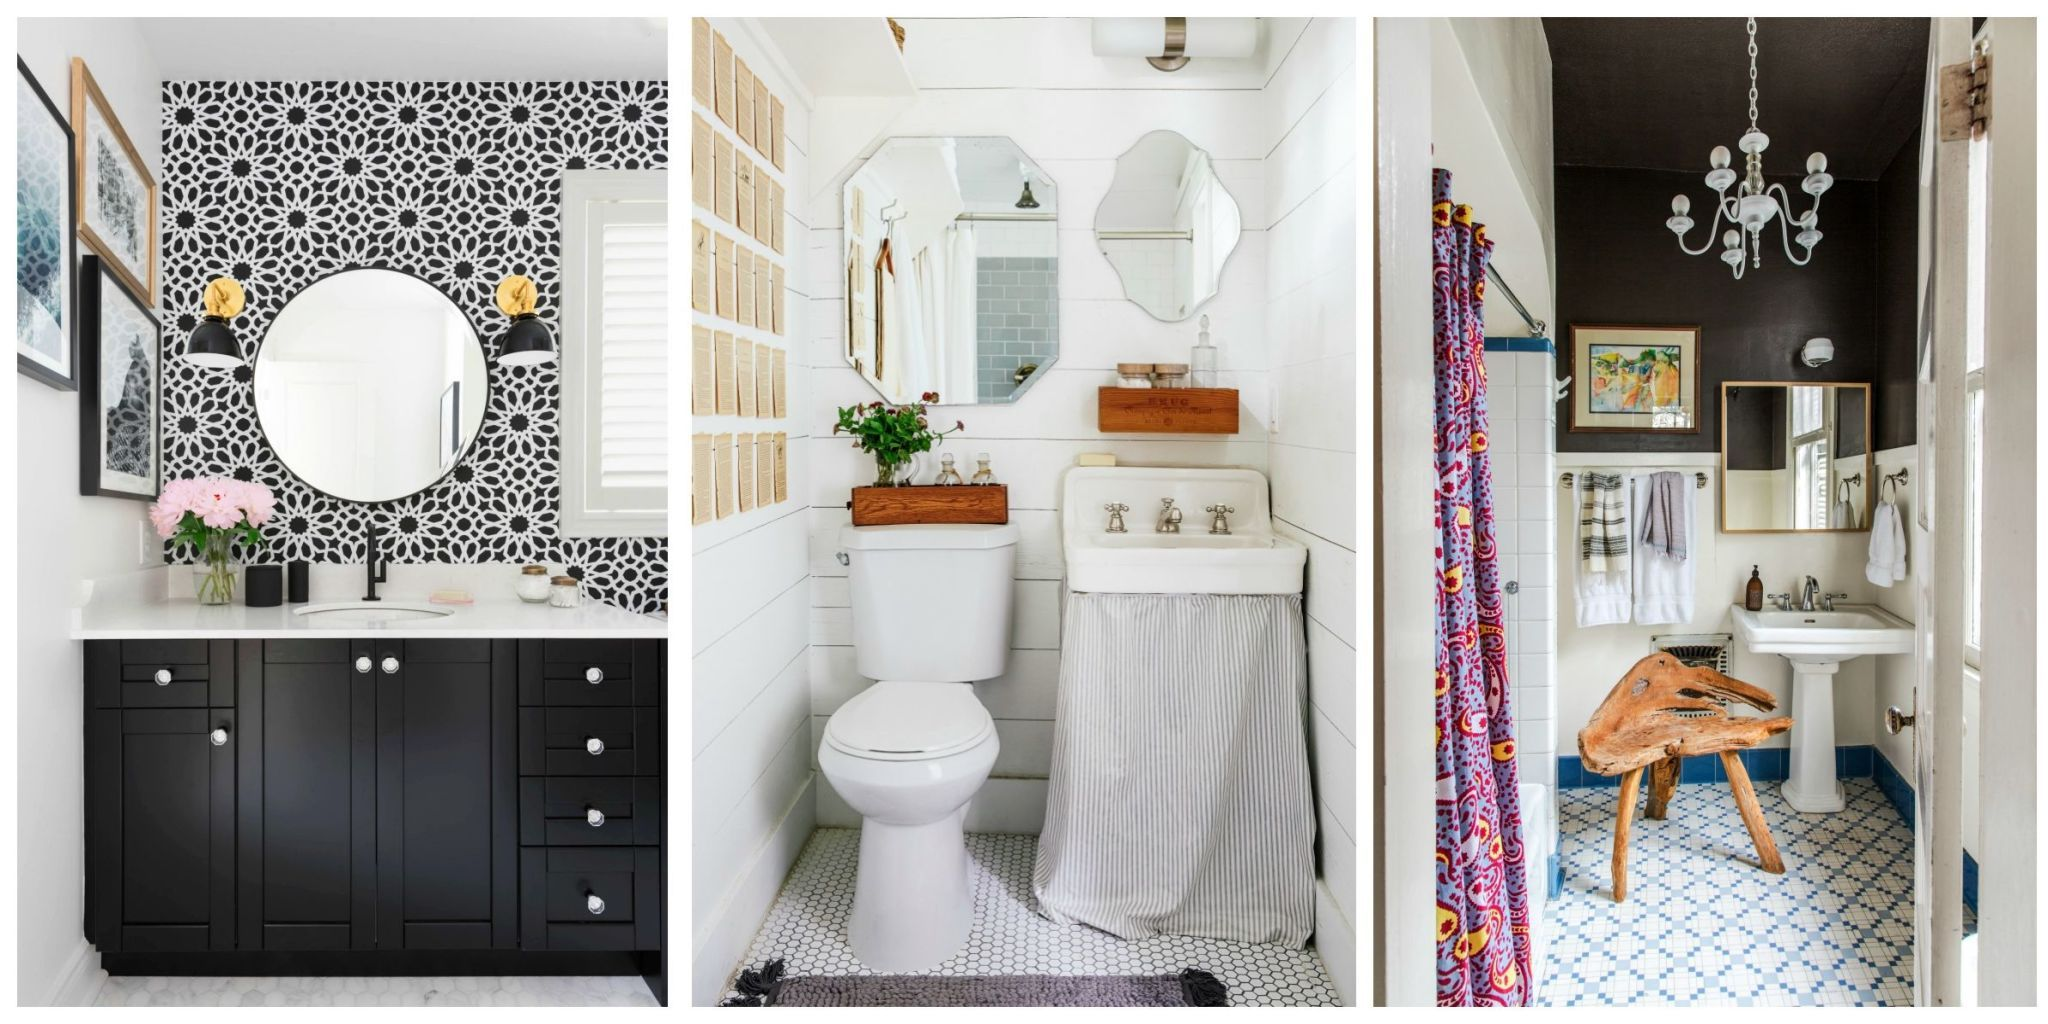 20 Bathroom Decorating Ideas Best Bathroom Decor Tips and Upgrades